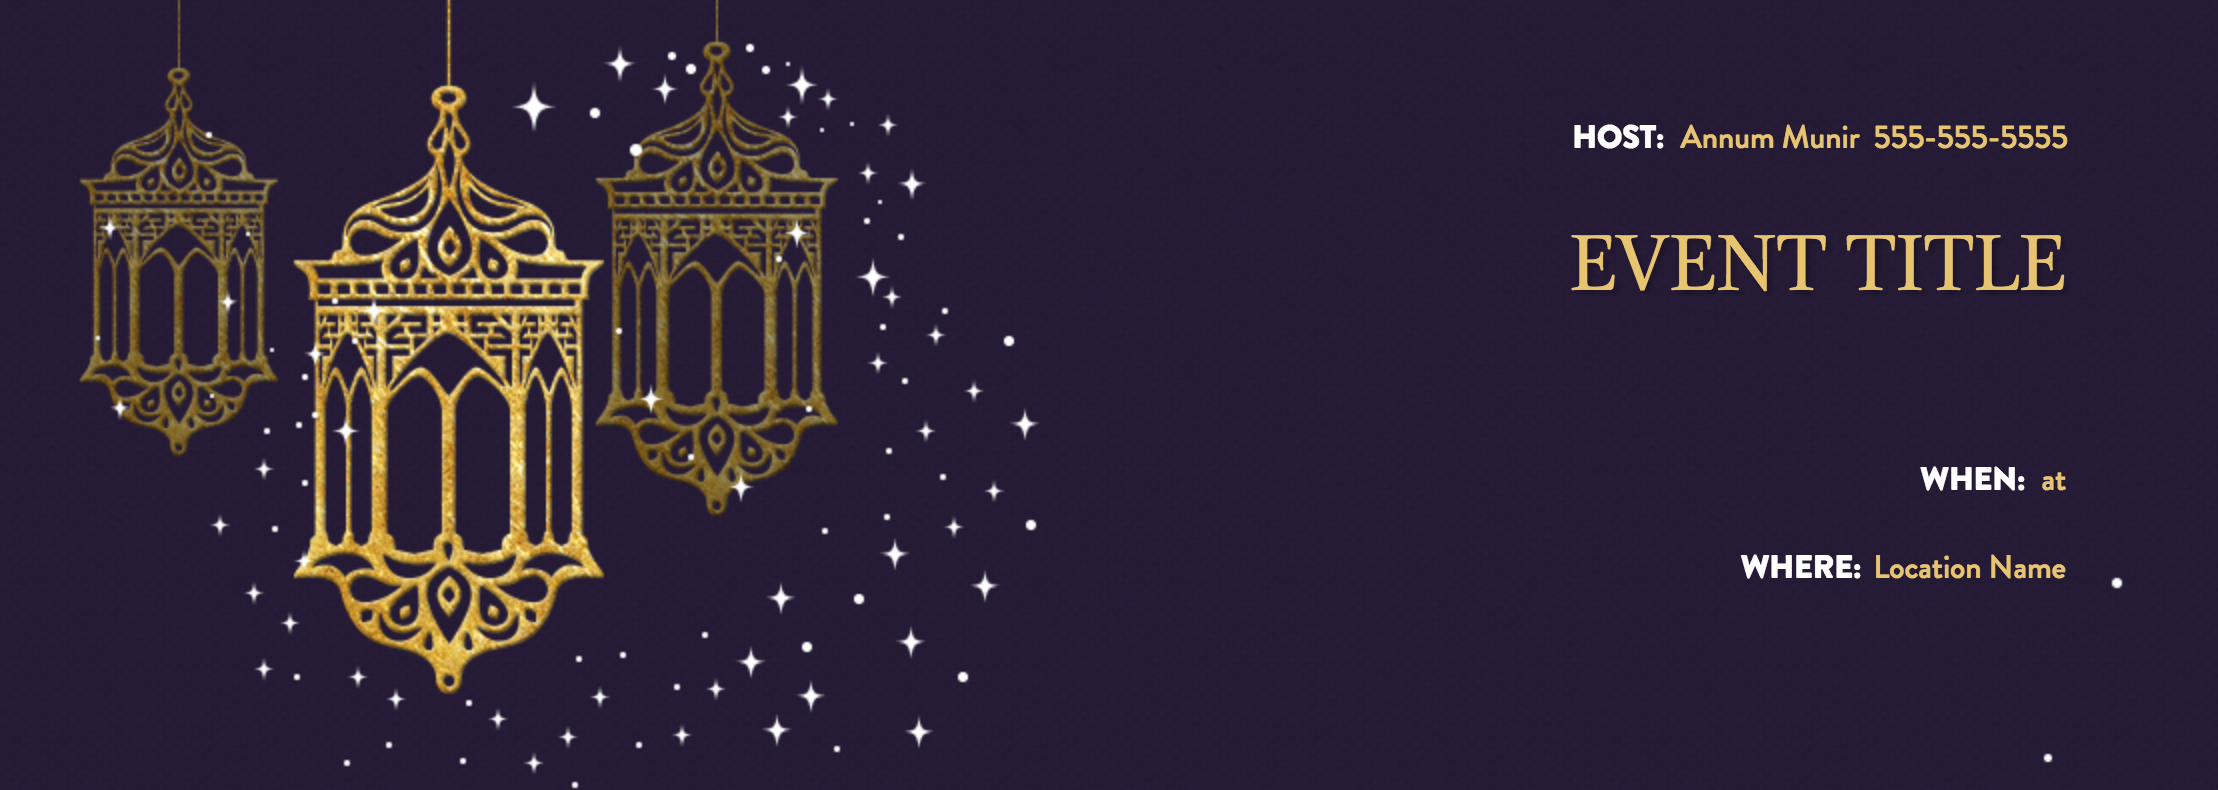 Eid-party-invitation-design.png